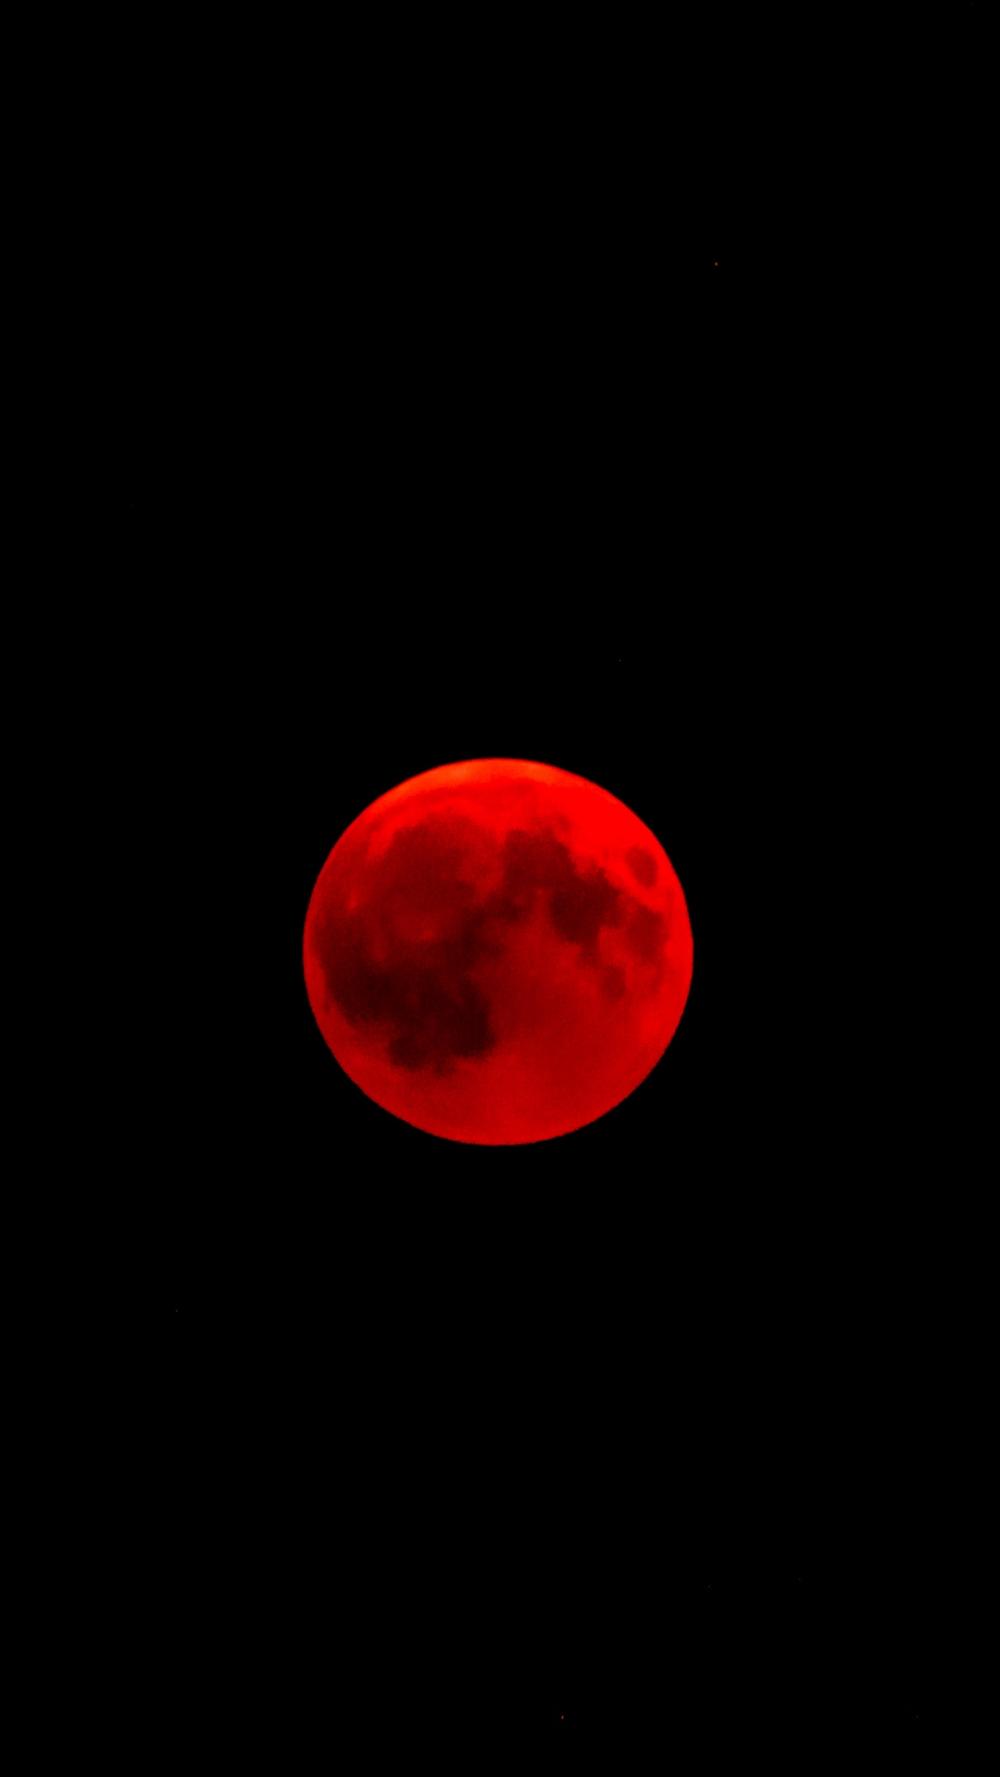 Eclipse Red Moon Red Moon Dark Red Wallpaper Galaxy Wallpaper